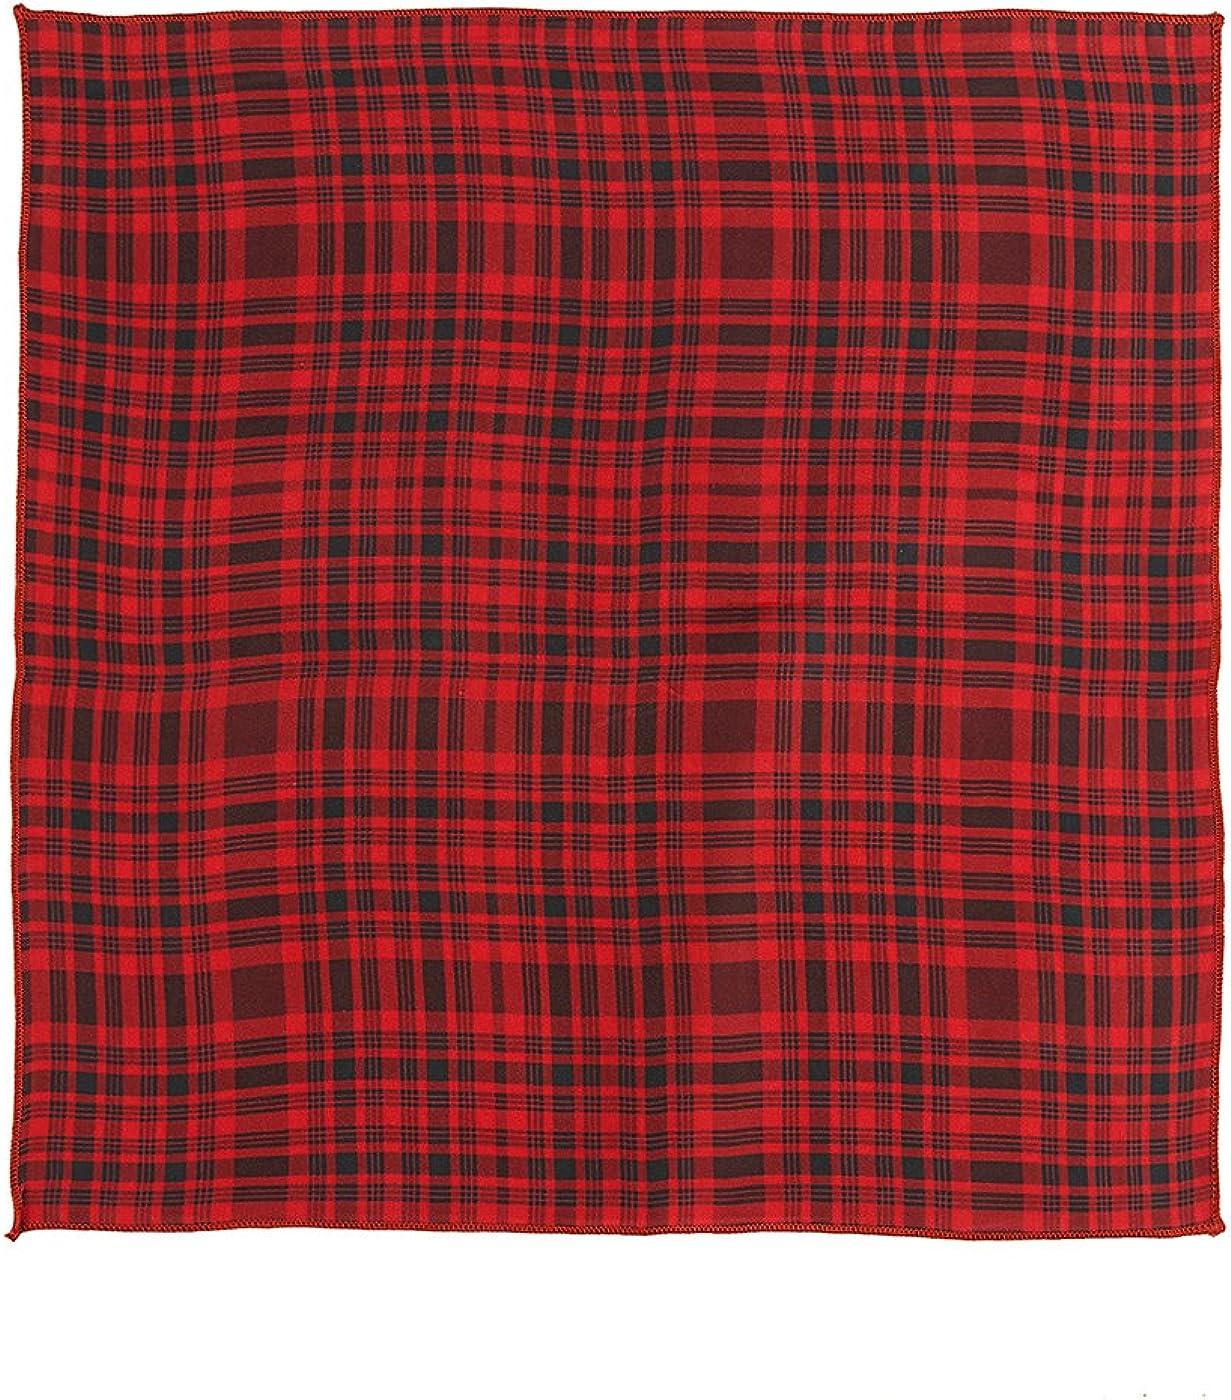 Chokore Red /& Black Silk Tie Plaids line